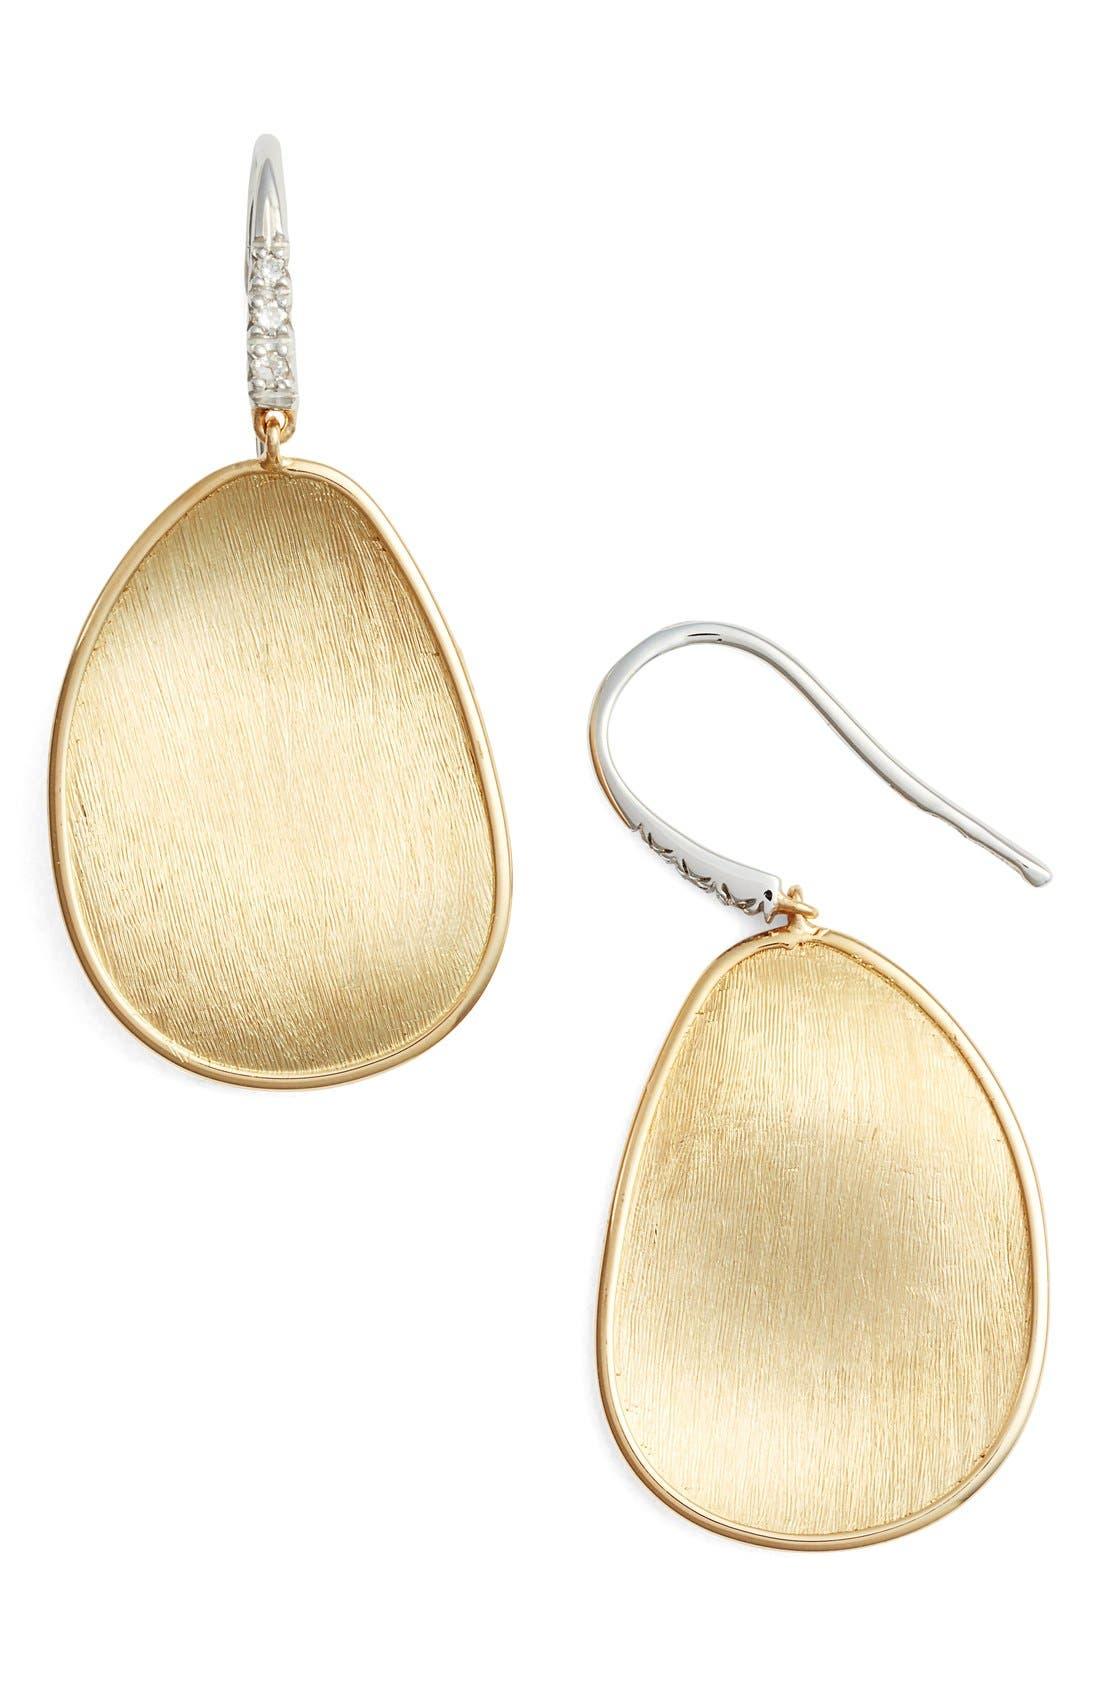 Lunaria Diamond & Gold Drop Earrings,                         Main,                         color, YELLOW GOLD